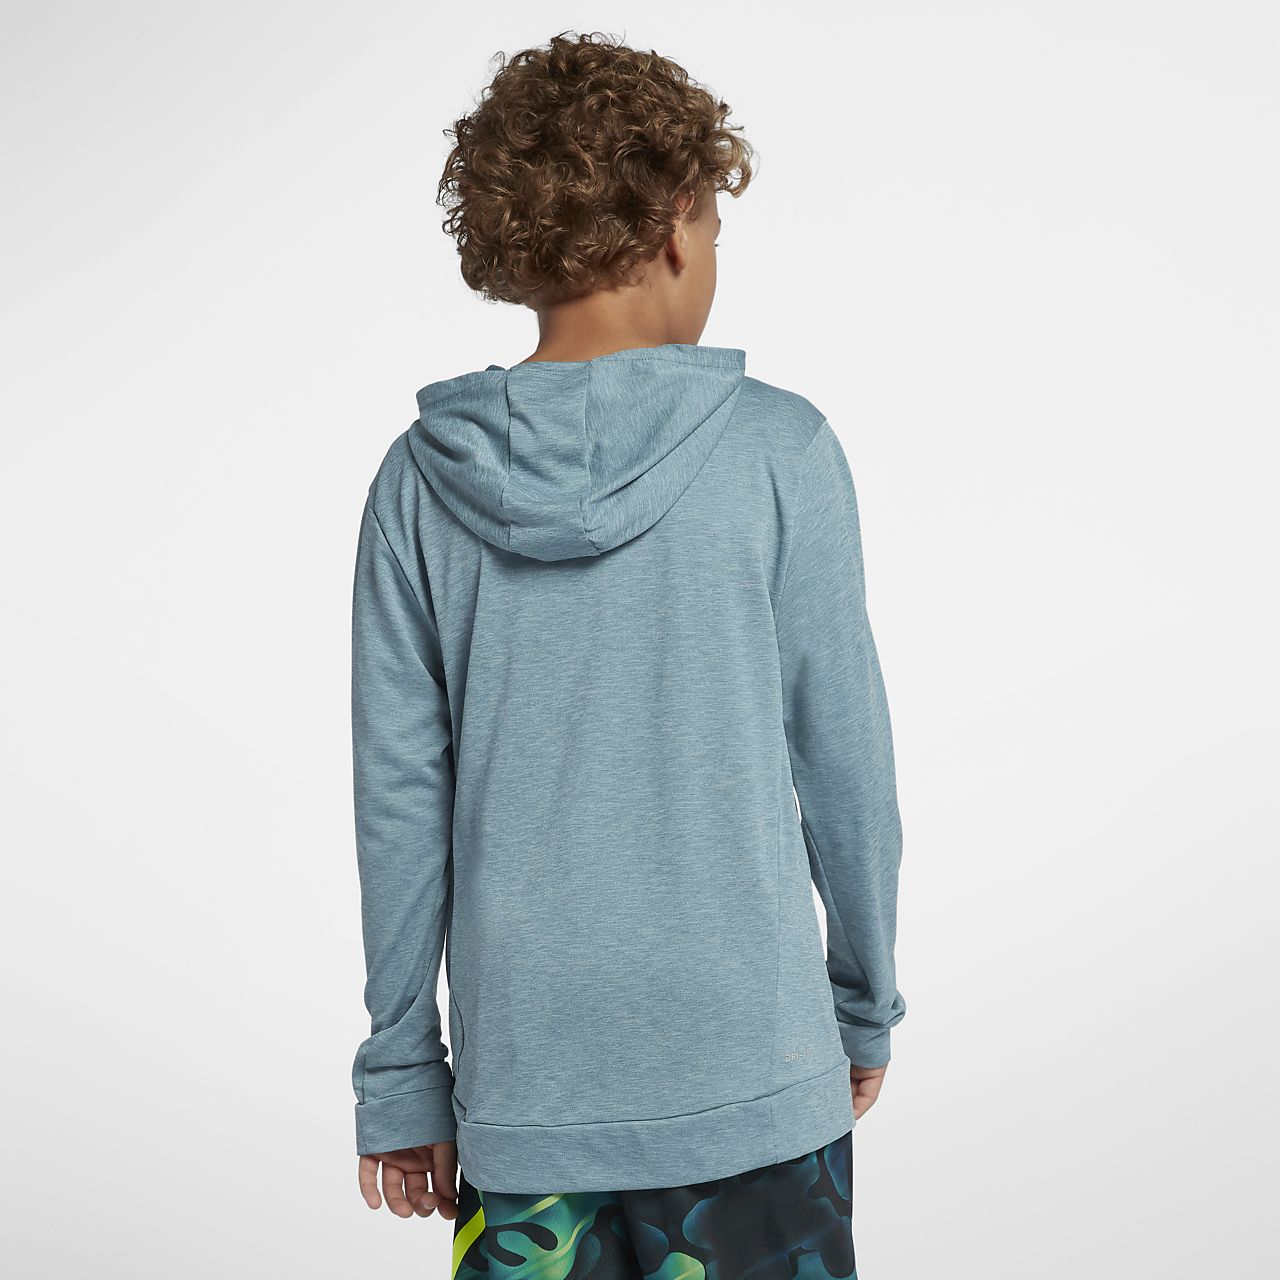 ac0845ab ... Nike Dri-FIT Breathe Big Kids' (Boys') Long Sleeve Training Top